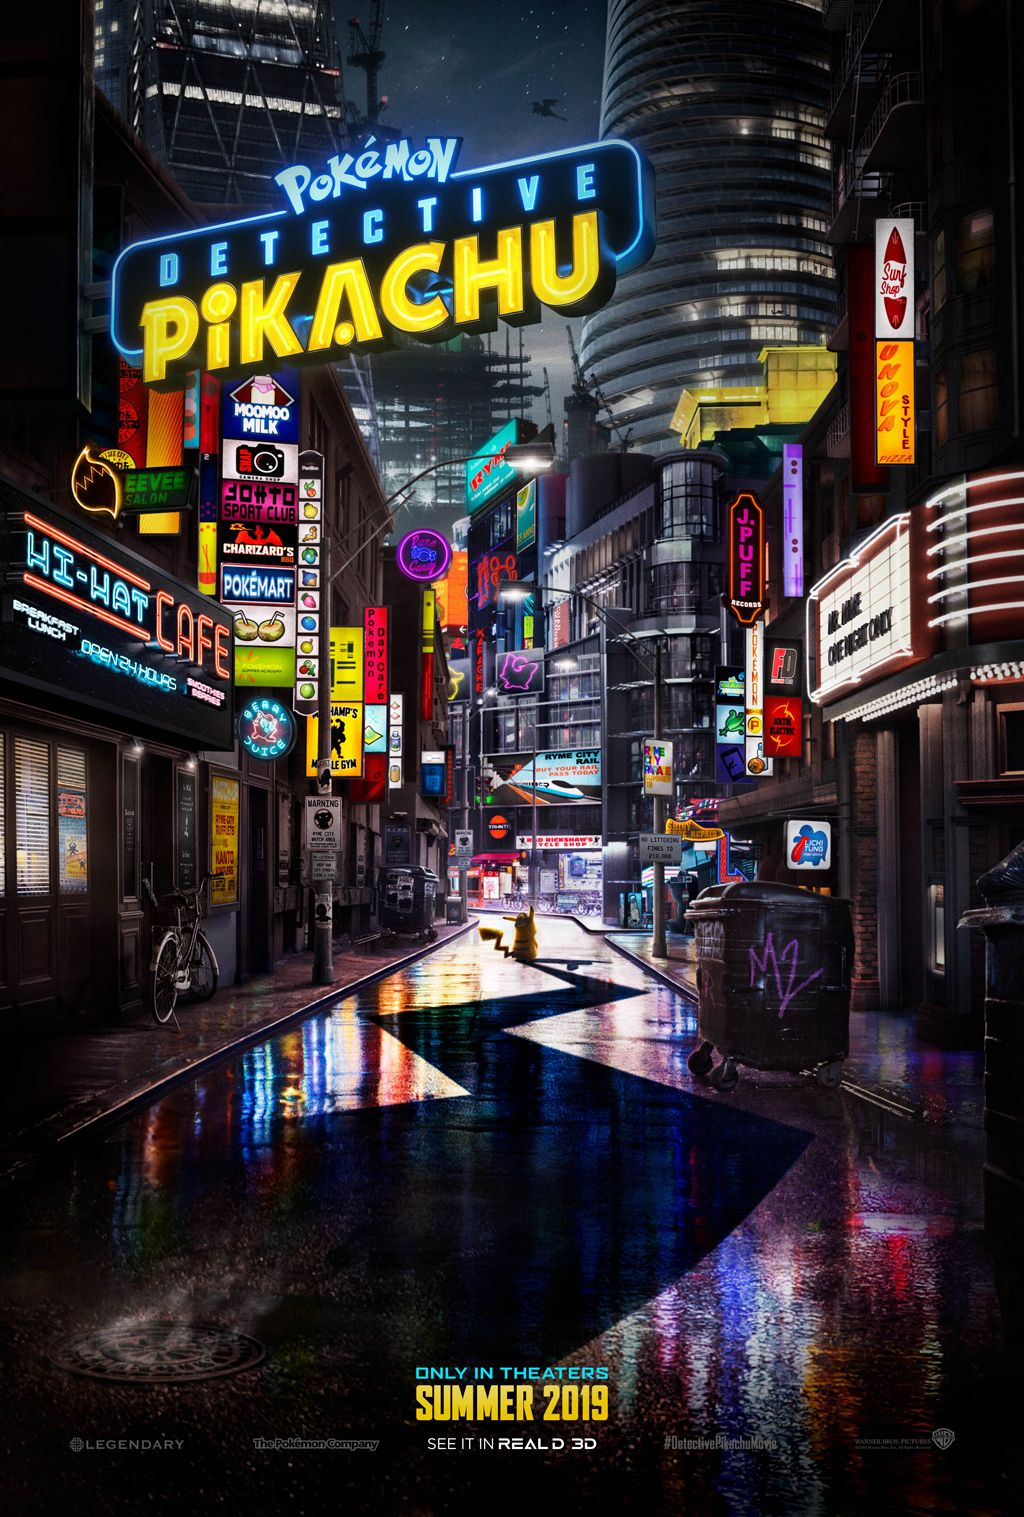 Detecthive Pikachu